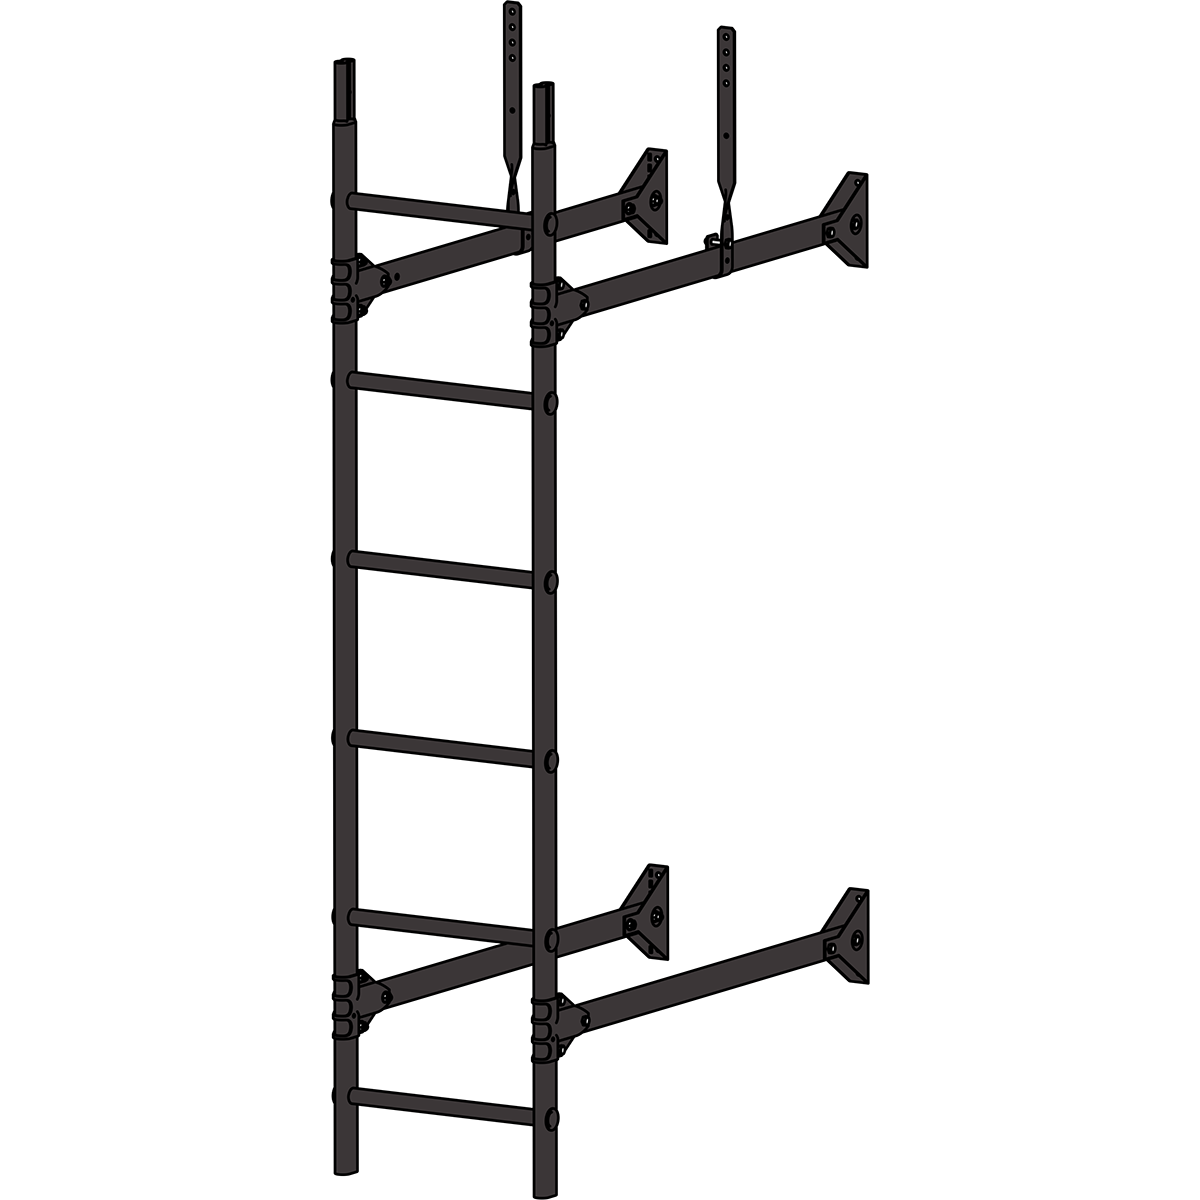 Лестница стеновая ROOFSYSTEMS PRESTIGE ZN 1,2 м RAL 8019 Серо-коричневый